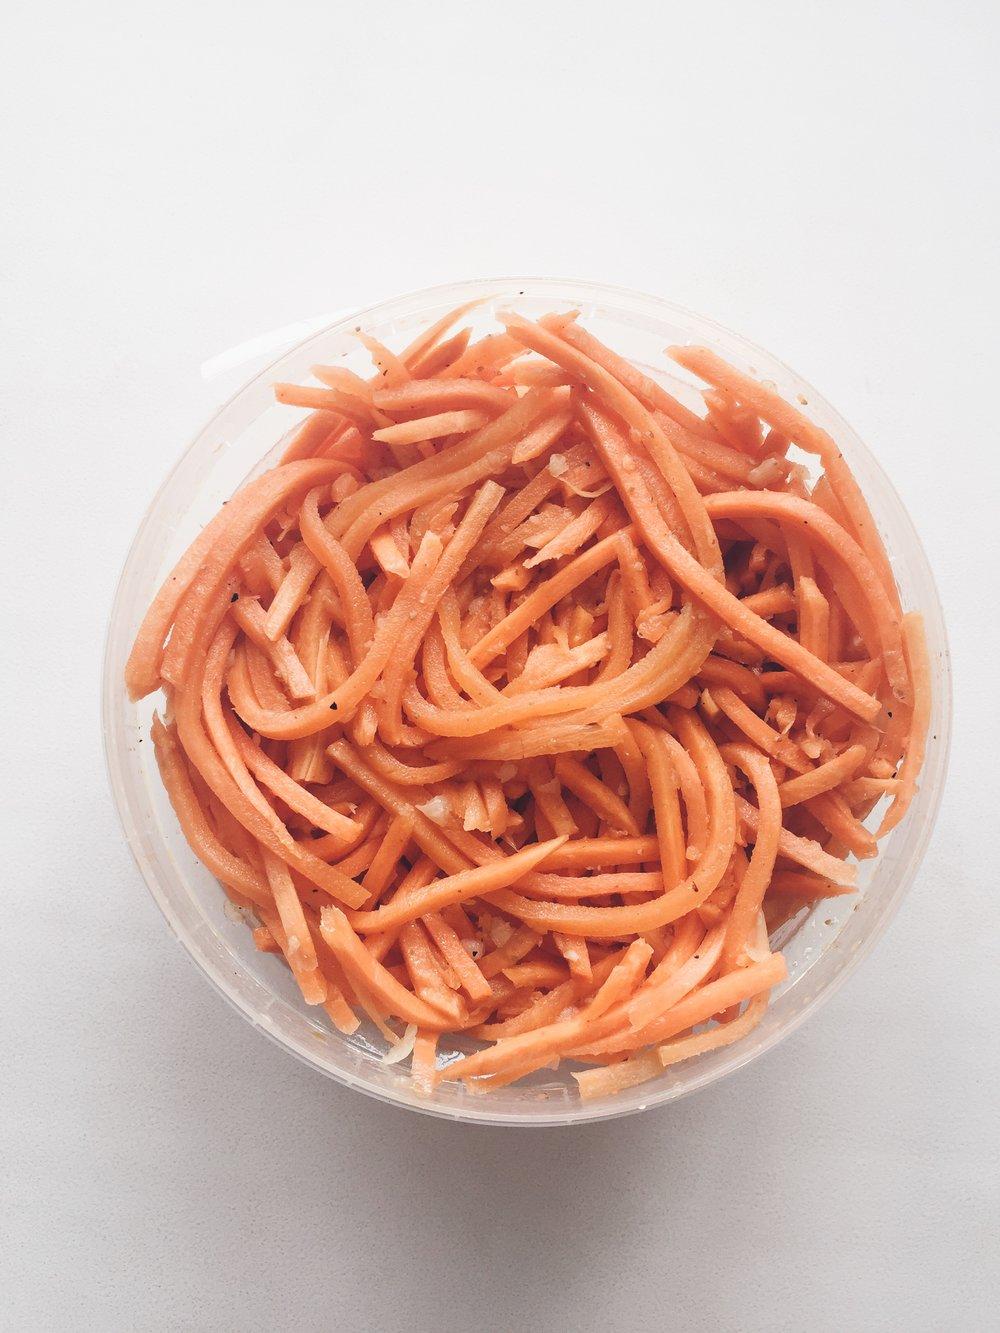 Carrots marinated in garlic.